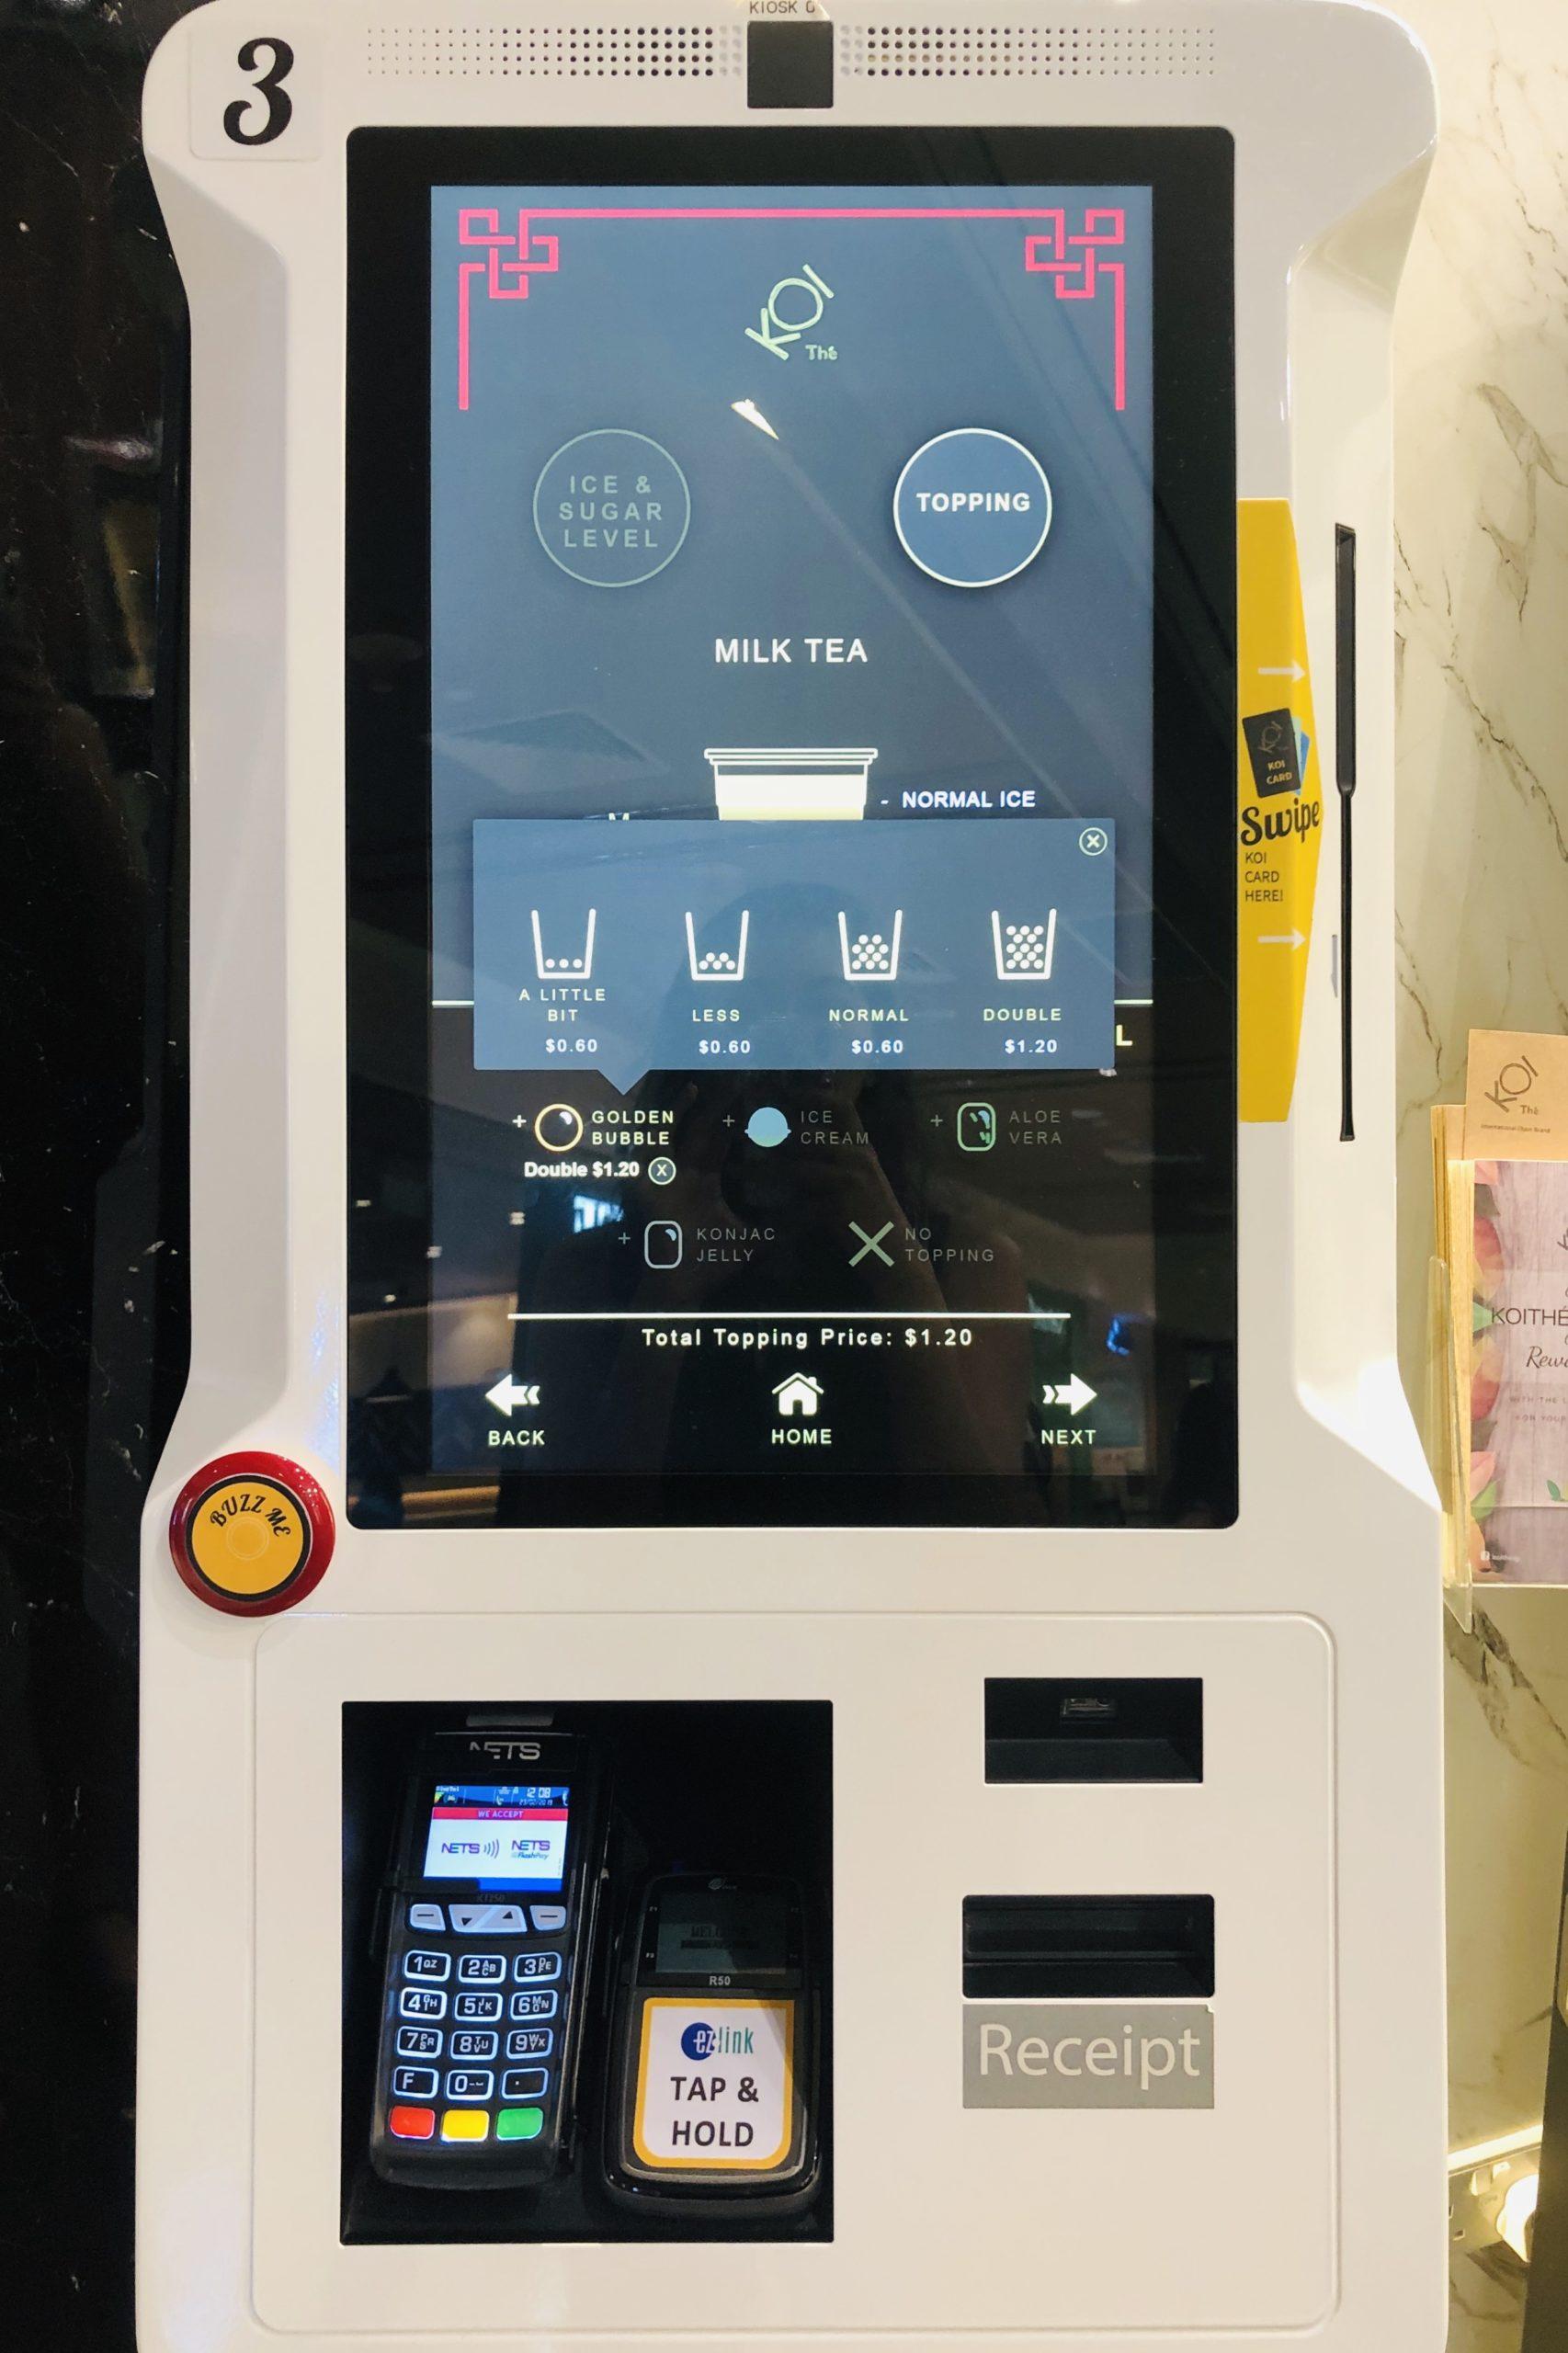 KOI Vending Machine Singapore